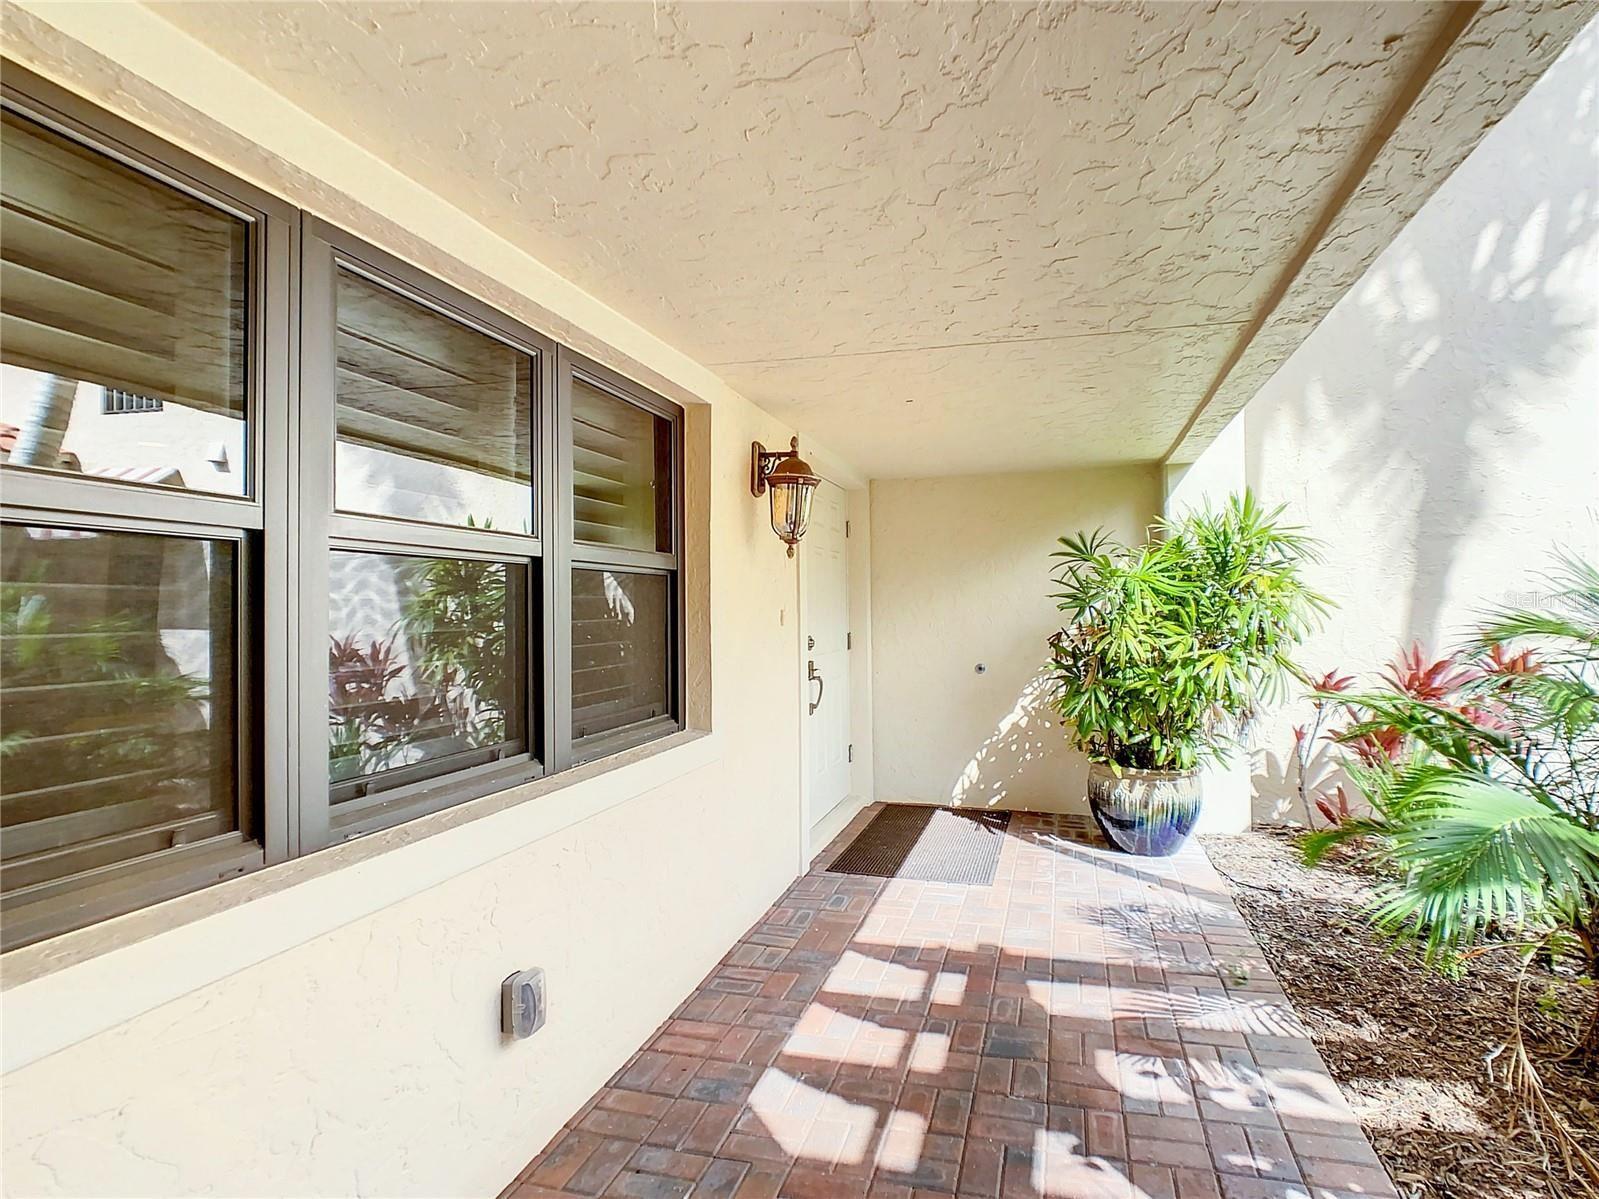 Photo of 718 GOLDEN BEACH BOULEVARD #4, VENICE, FL 34285 (MLS # N6118164)